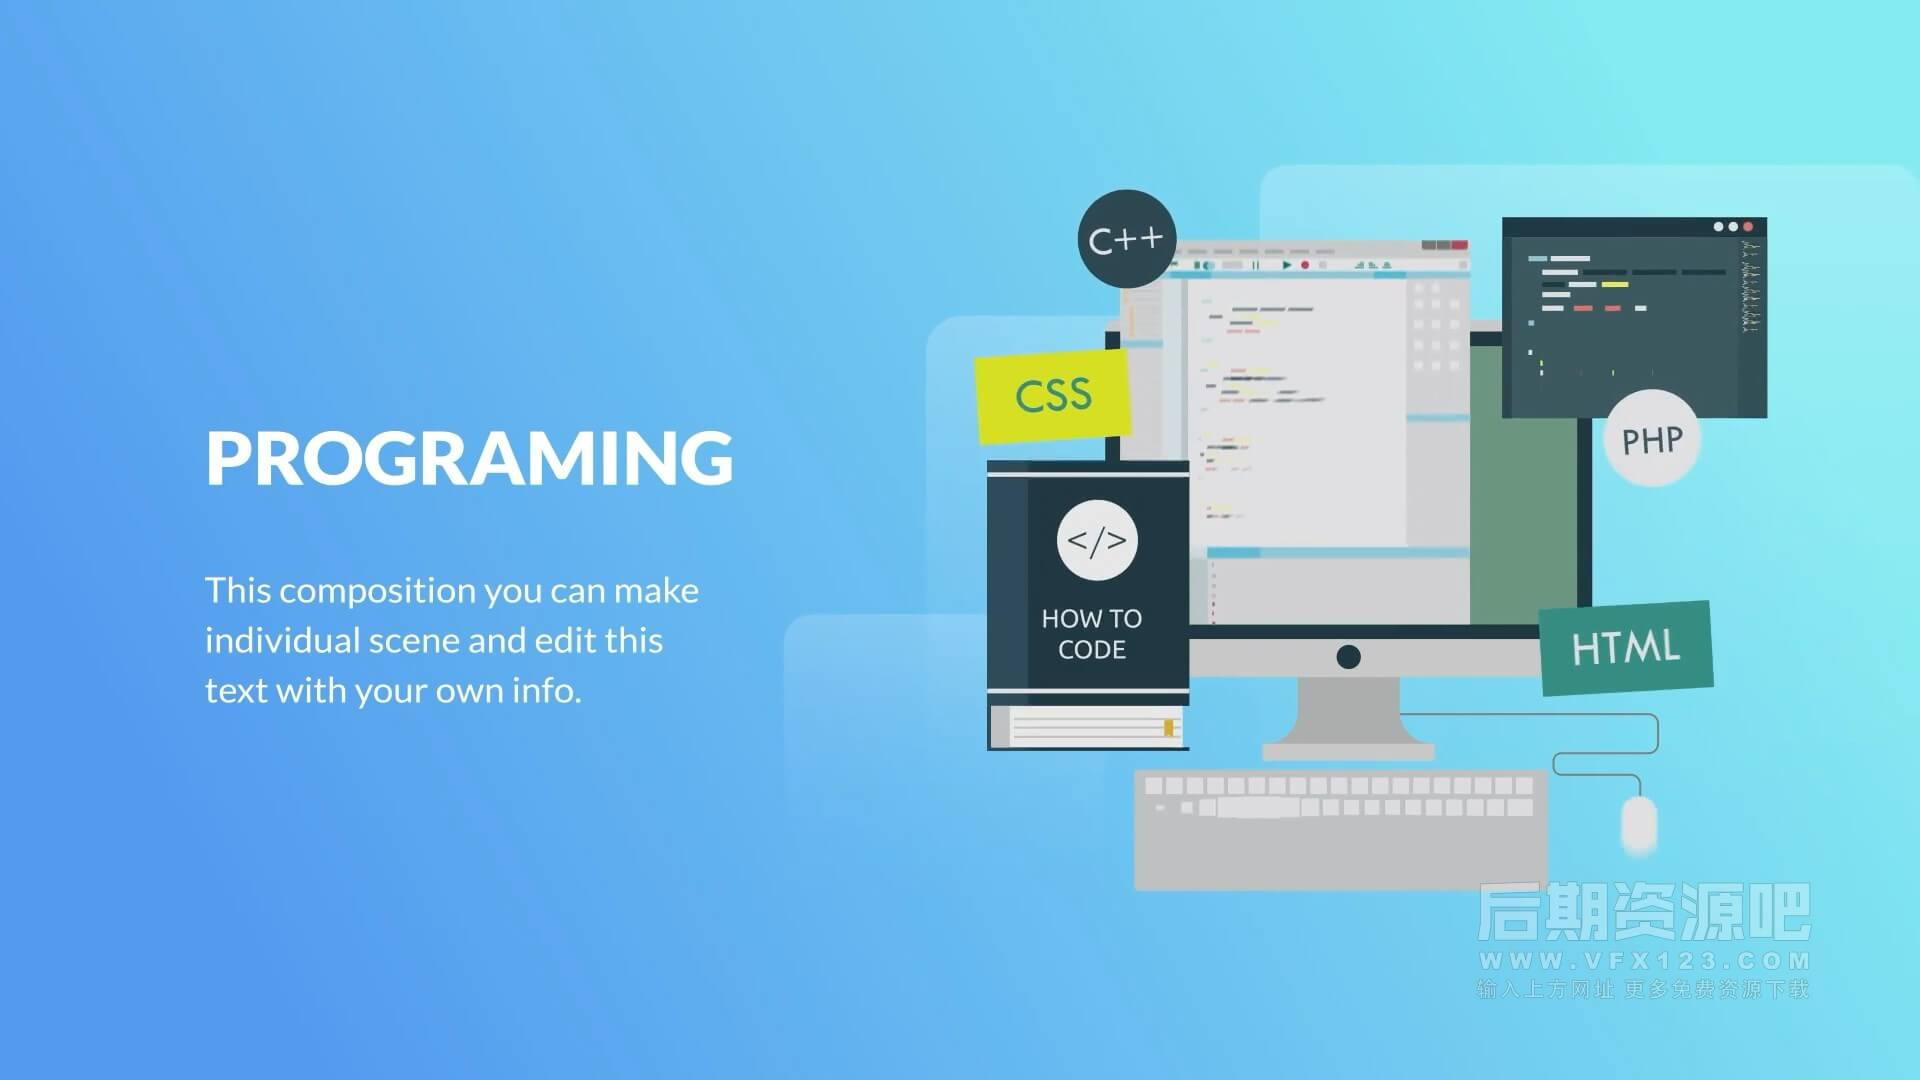 fcpx插件 设计开发学校相关演示文稿场景动画包 Design and Development Animation